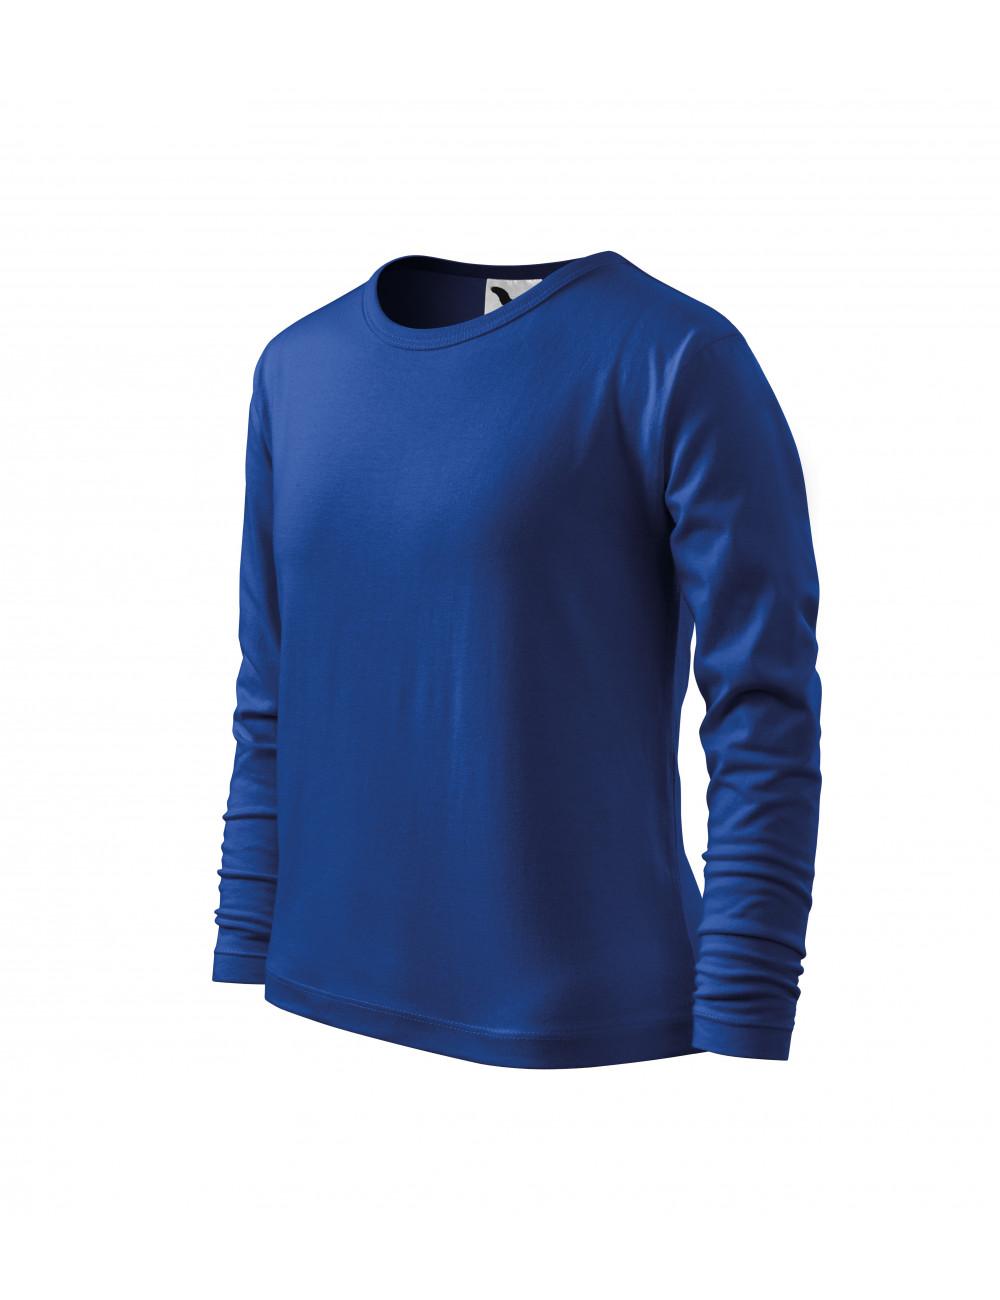 Adler MALFINI Koszulka dziecięca Long Sleeve 121 chabrowy